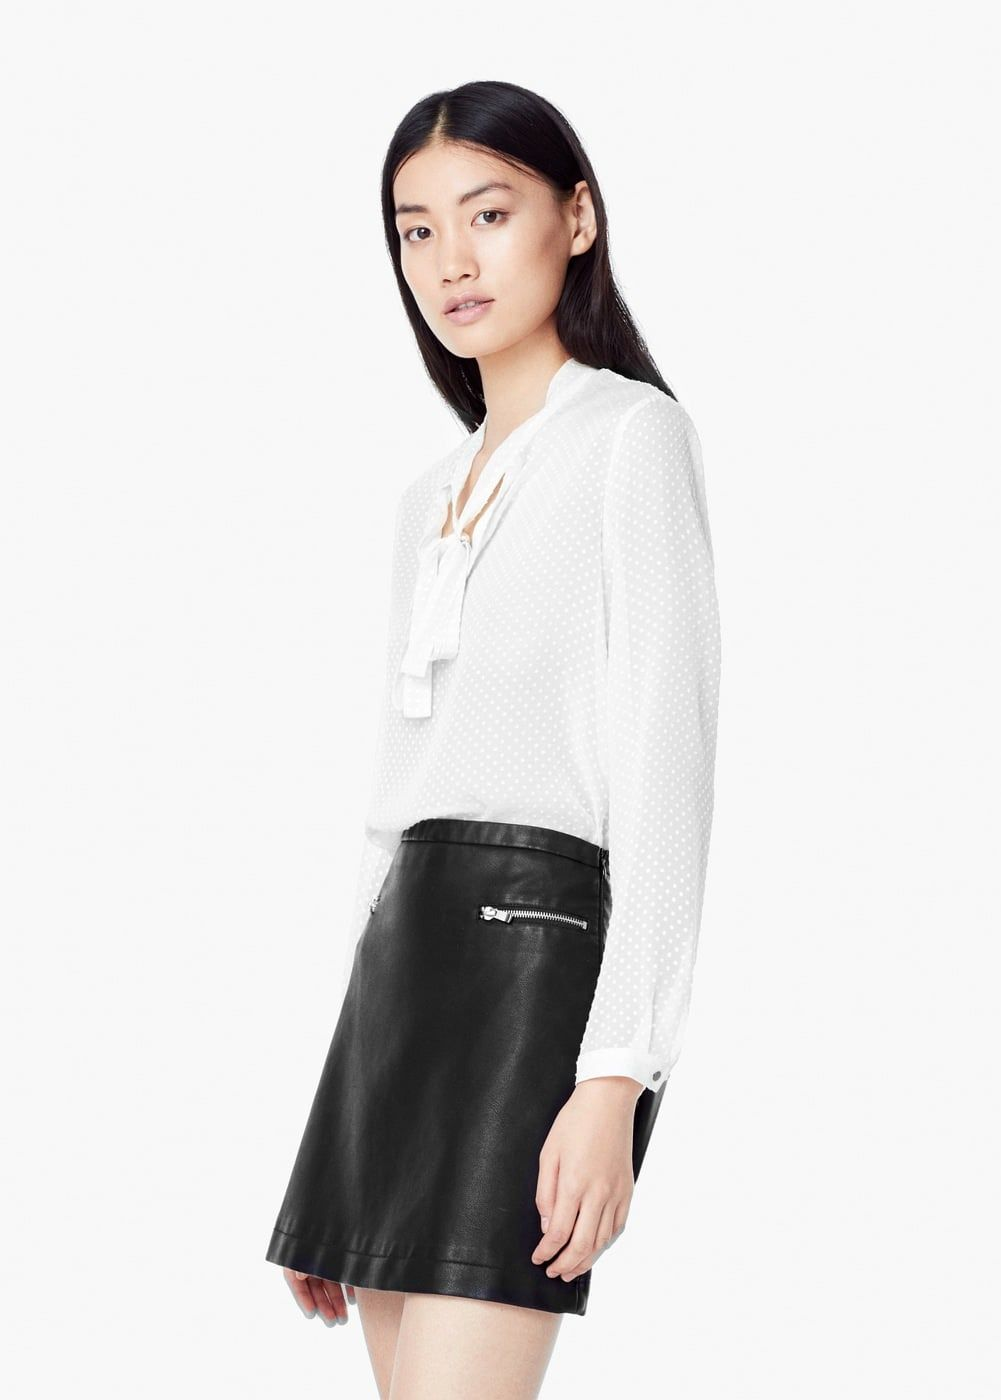 01d7c36d3 Blusa seda plumeti - Camisas de Mulher